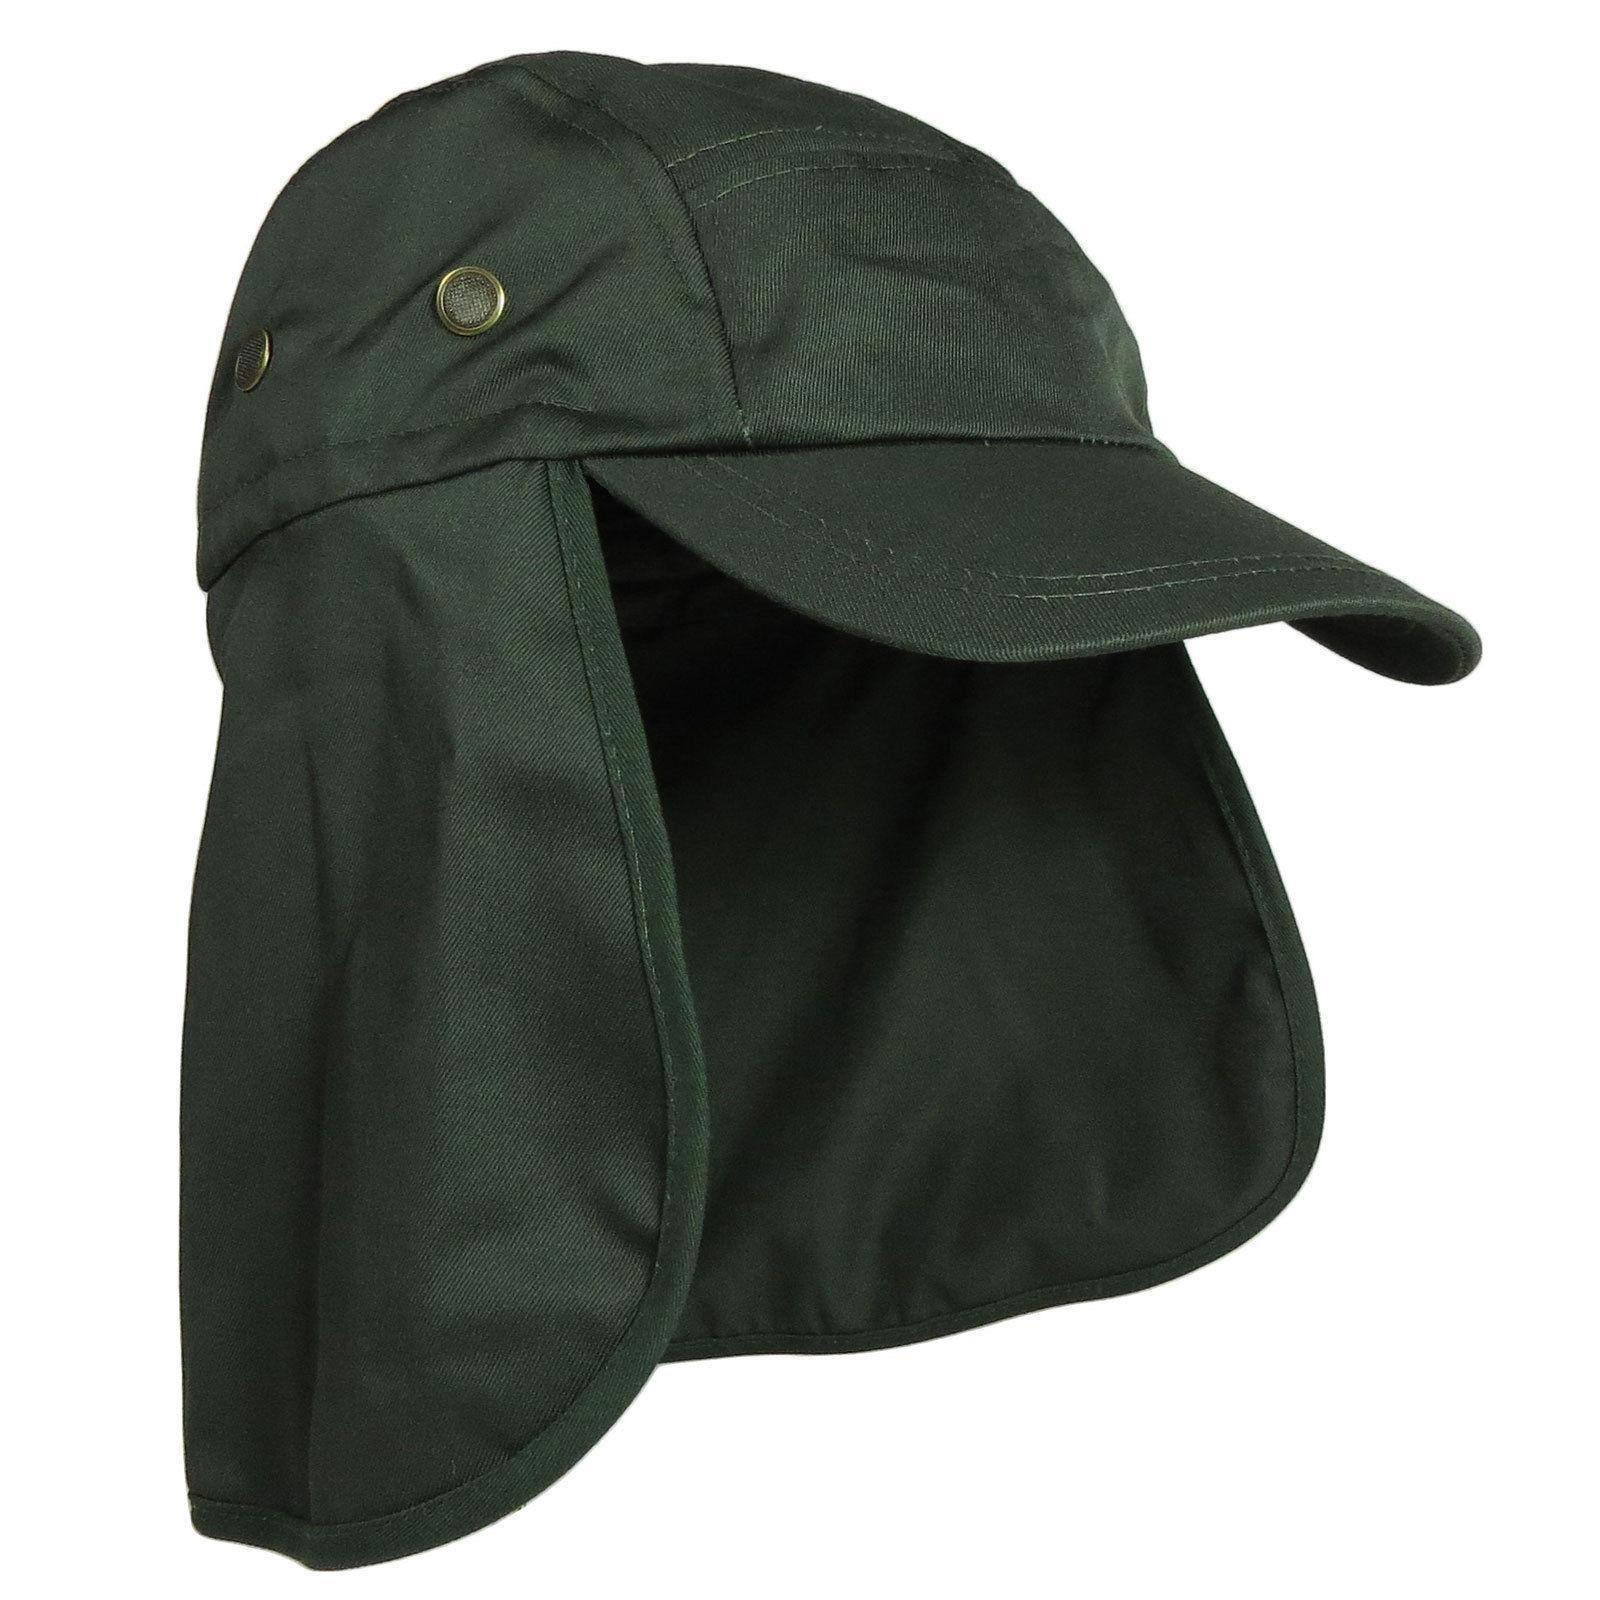 Baseball Cap Camping Fishing Neck Visor Army Hat